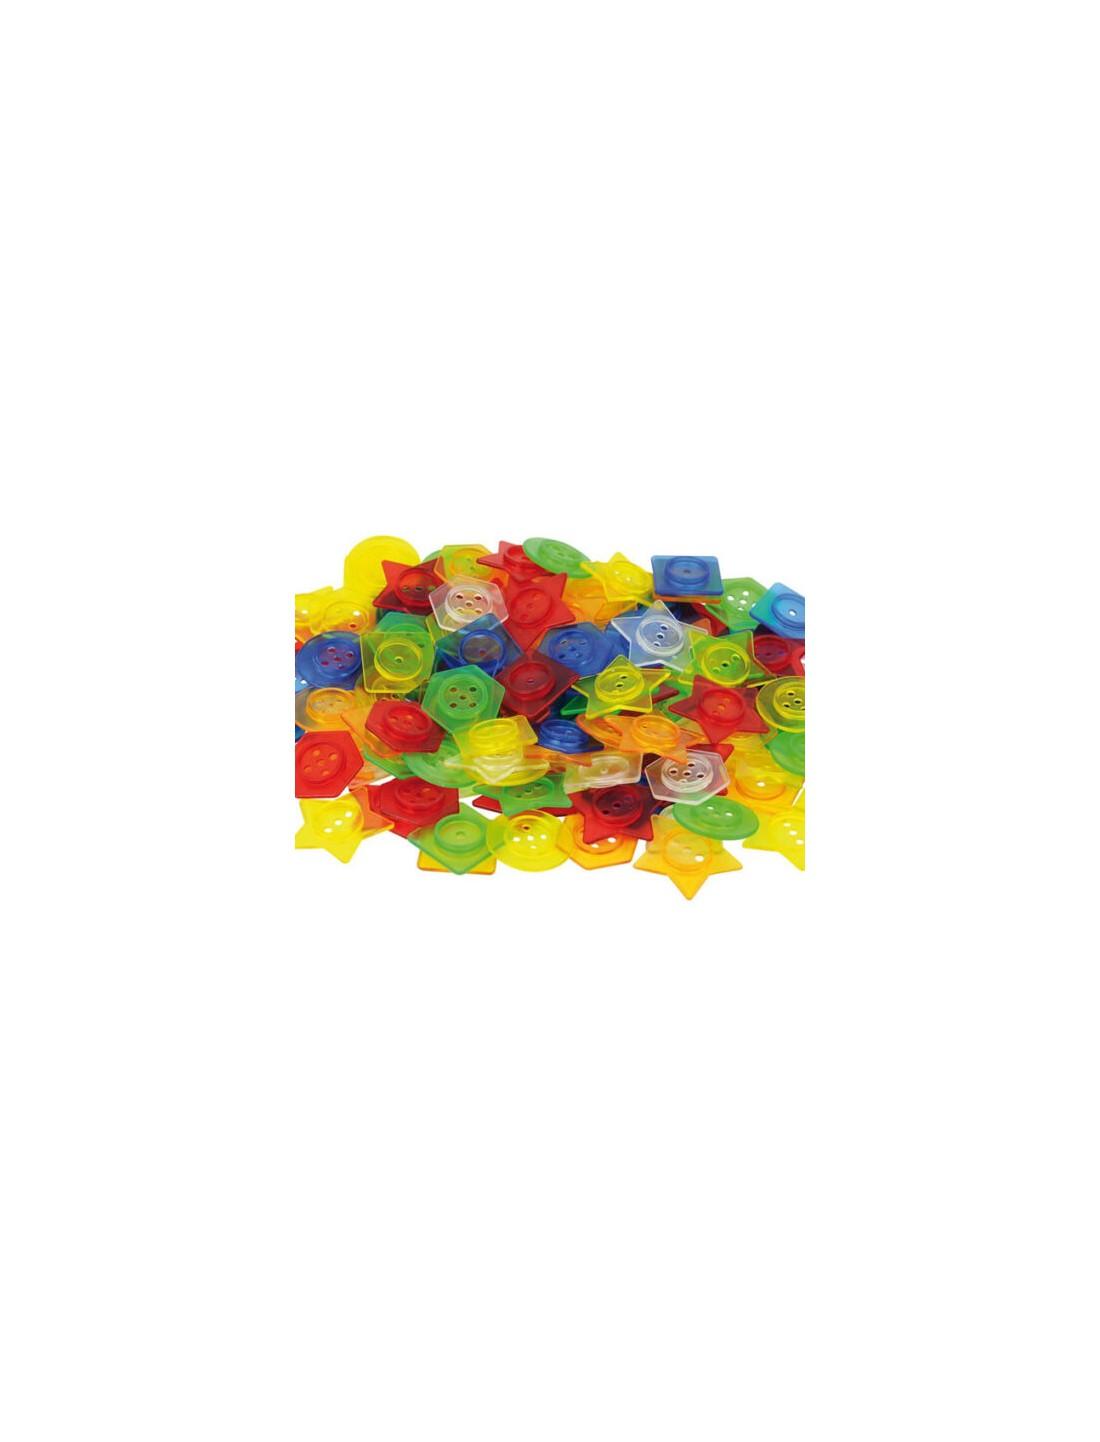 Botones plásticos traslúcidos. TickiT